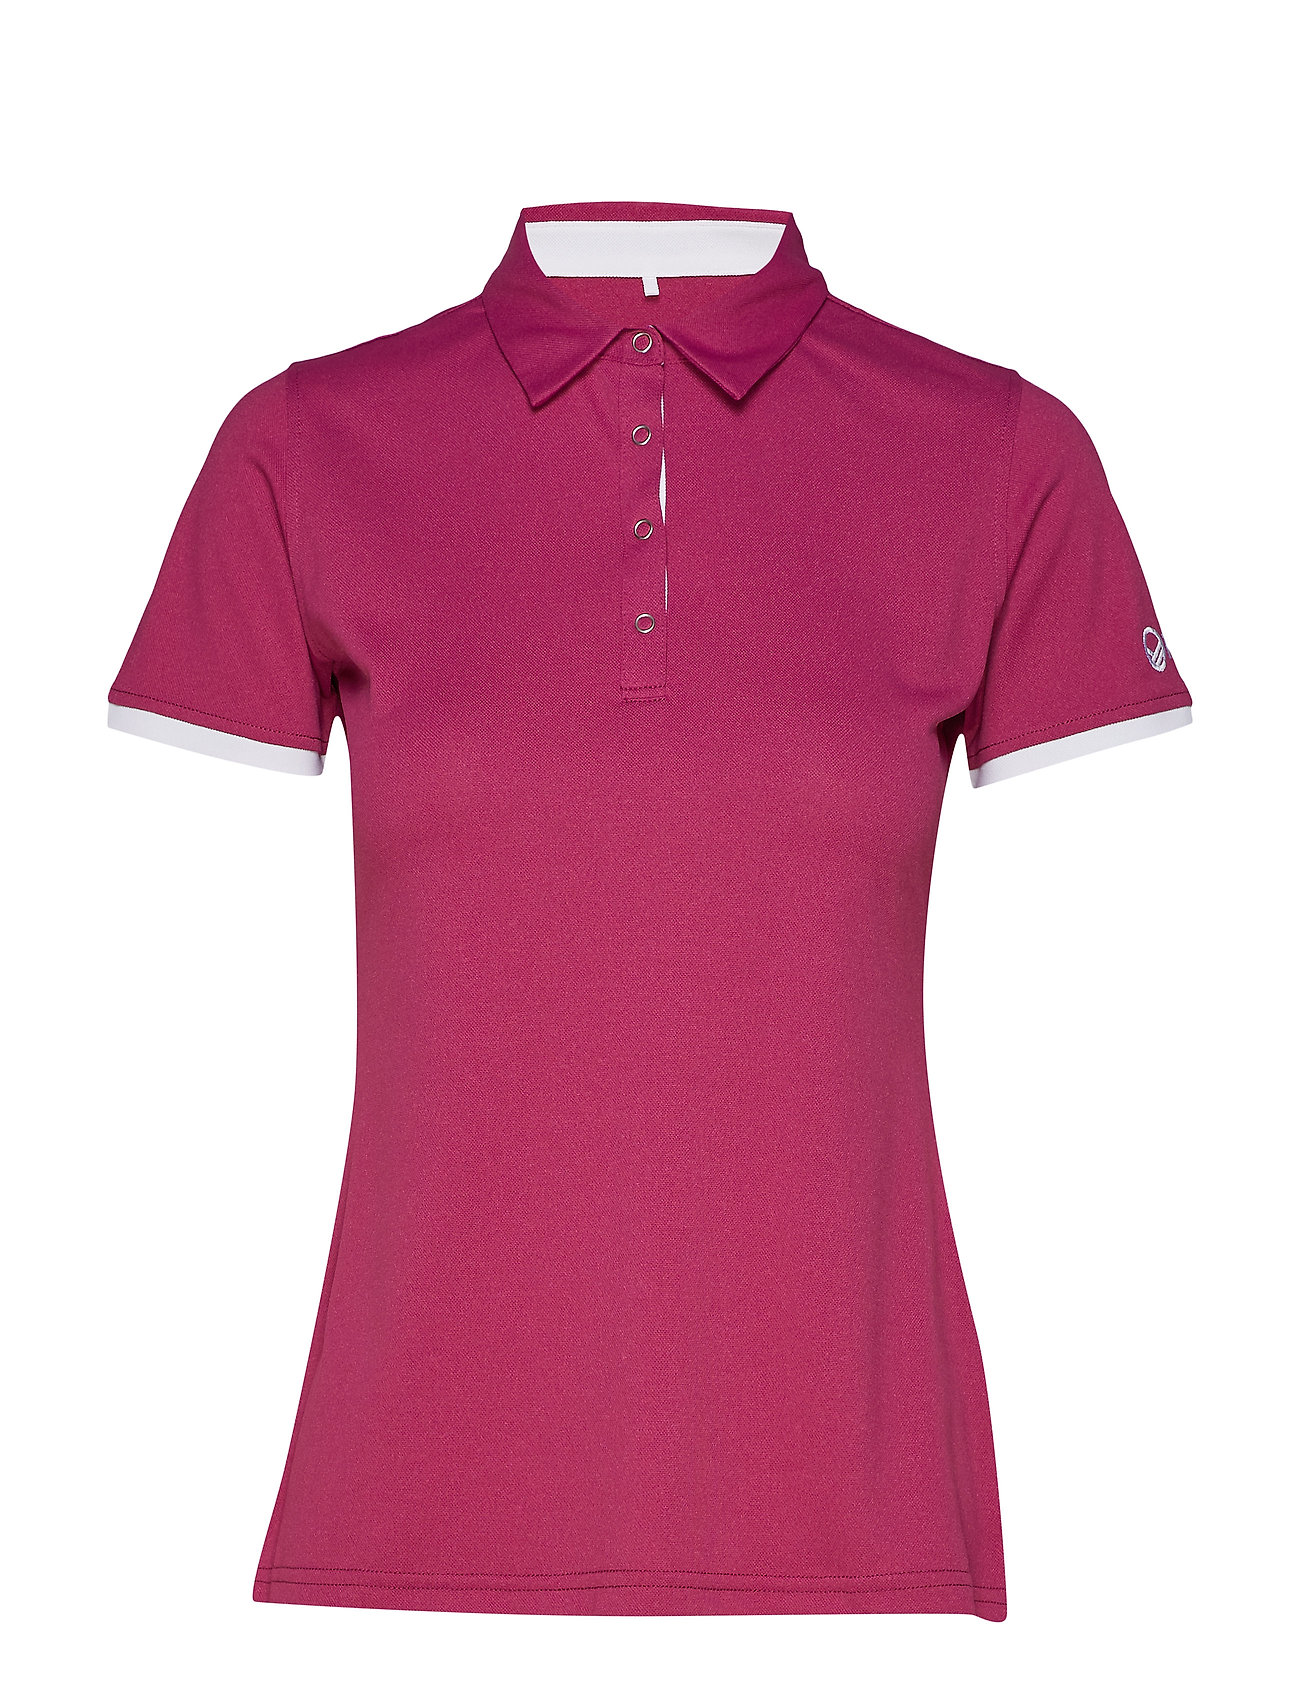 Halti Inka W Shirt - WILD ASTER PURPLE